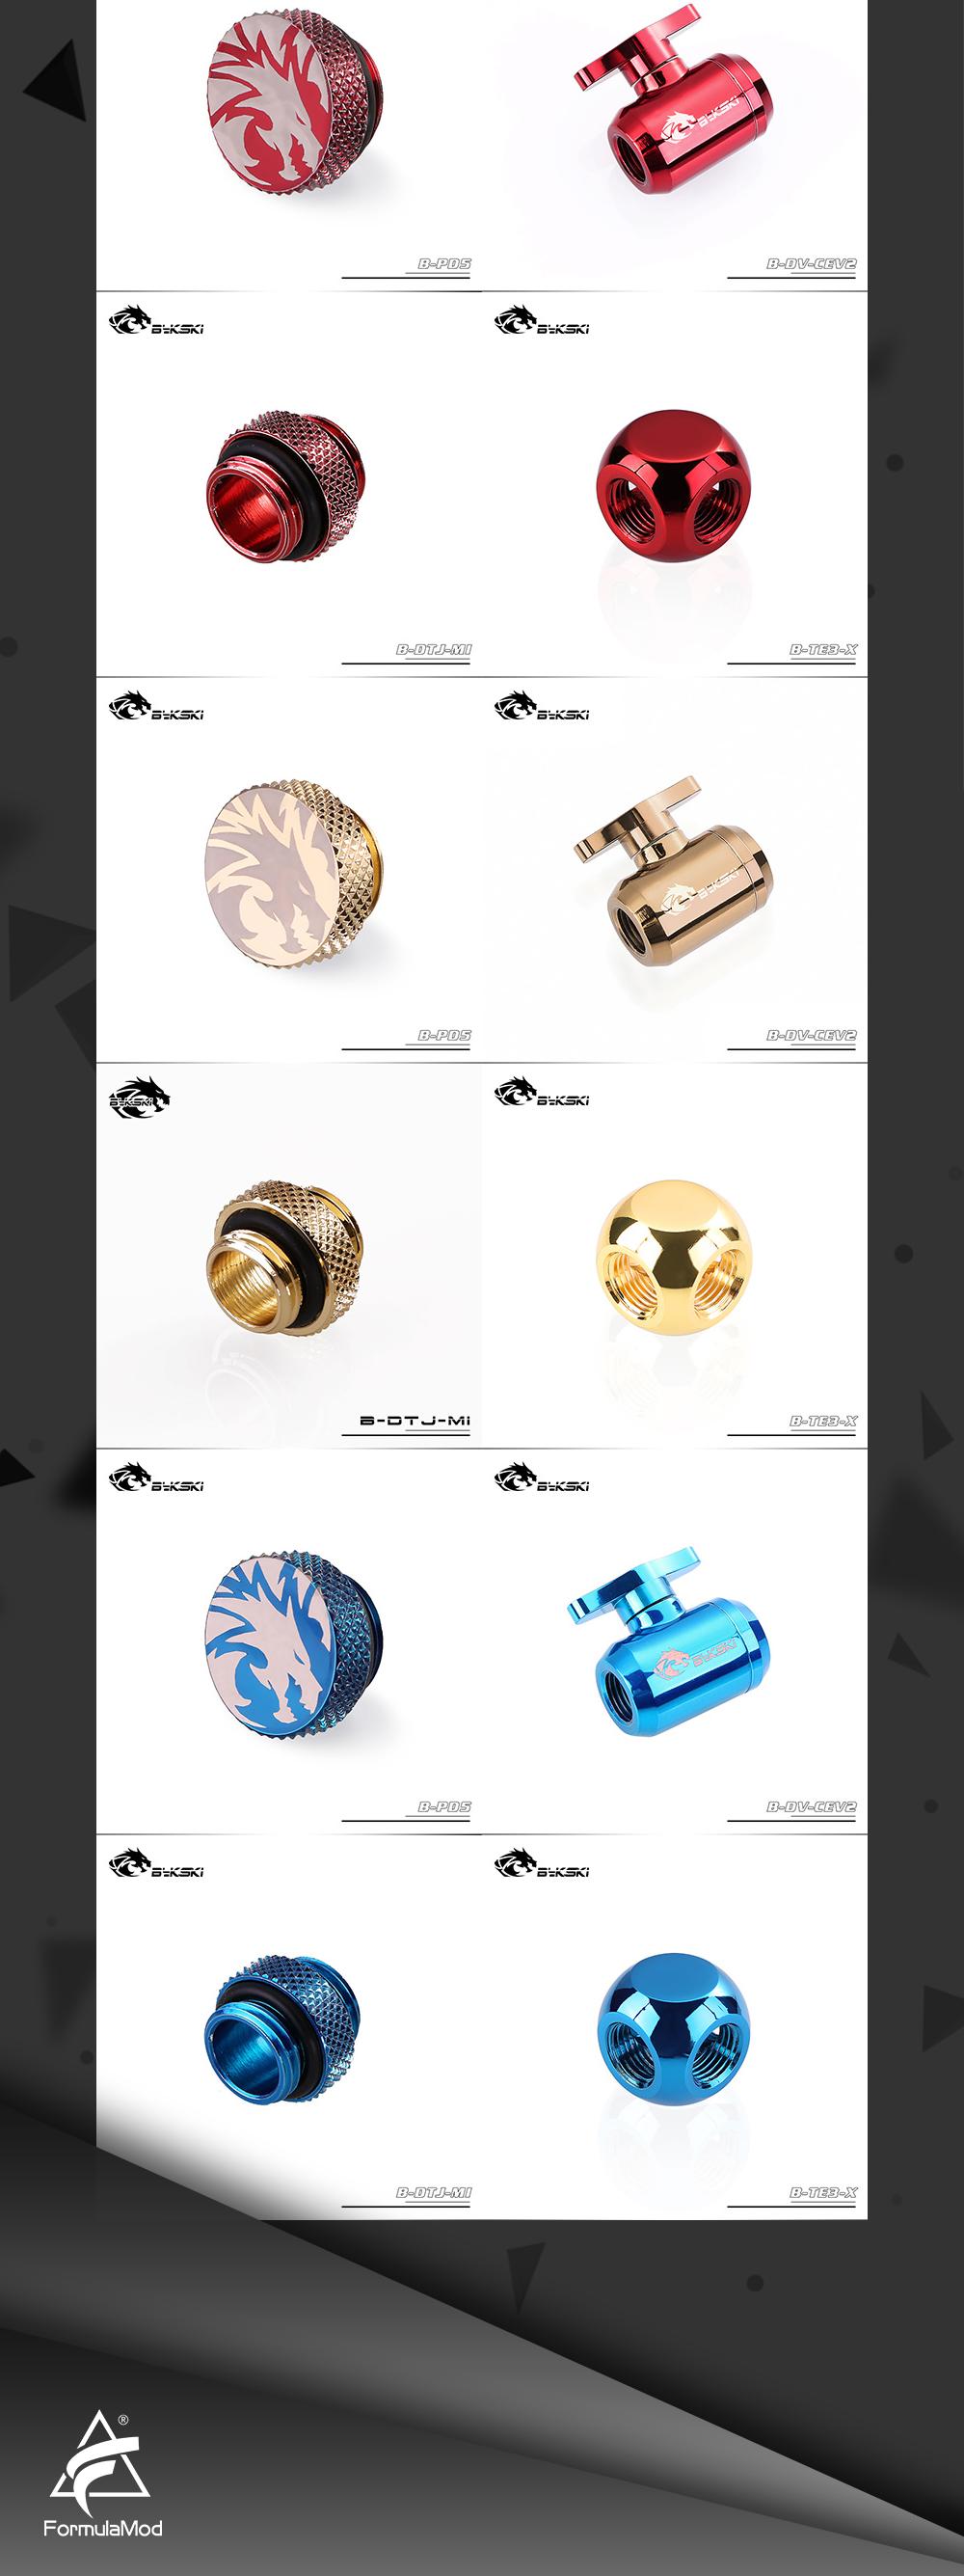 "Valve Kit Drain Push Water Combination Ball G1/4"" Computer Case Cooling Copper & Aluminum Bykski, B-HP-DV-GC"